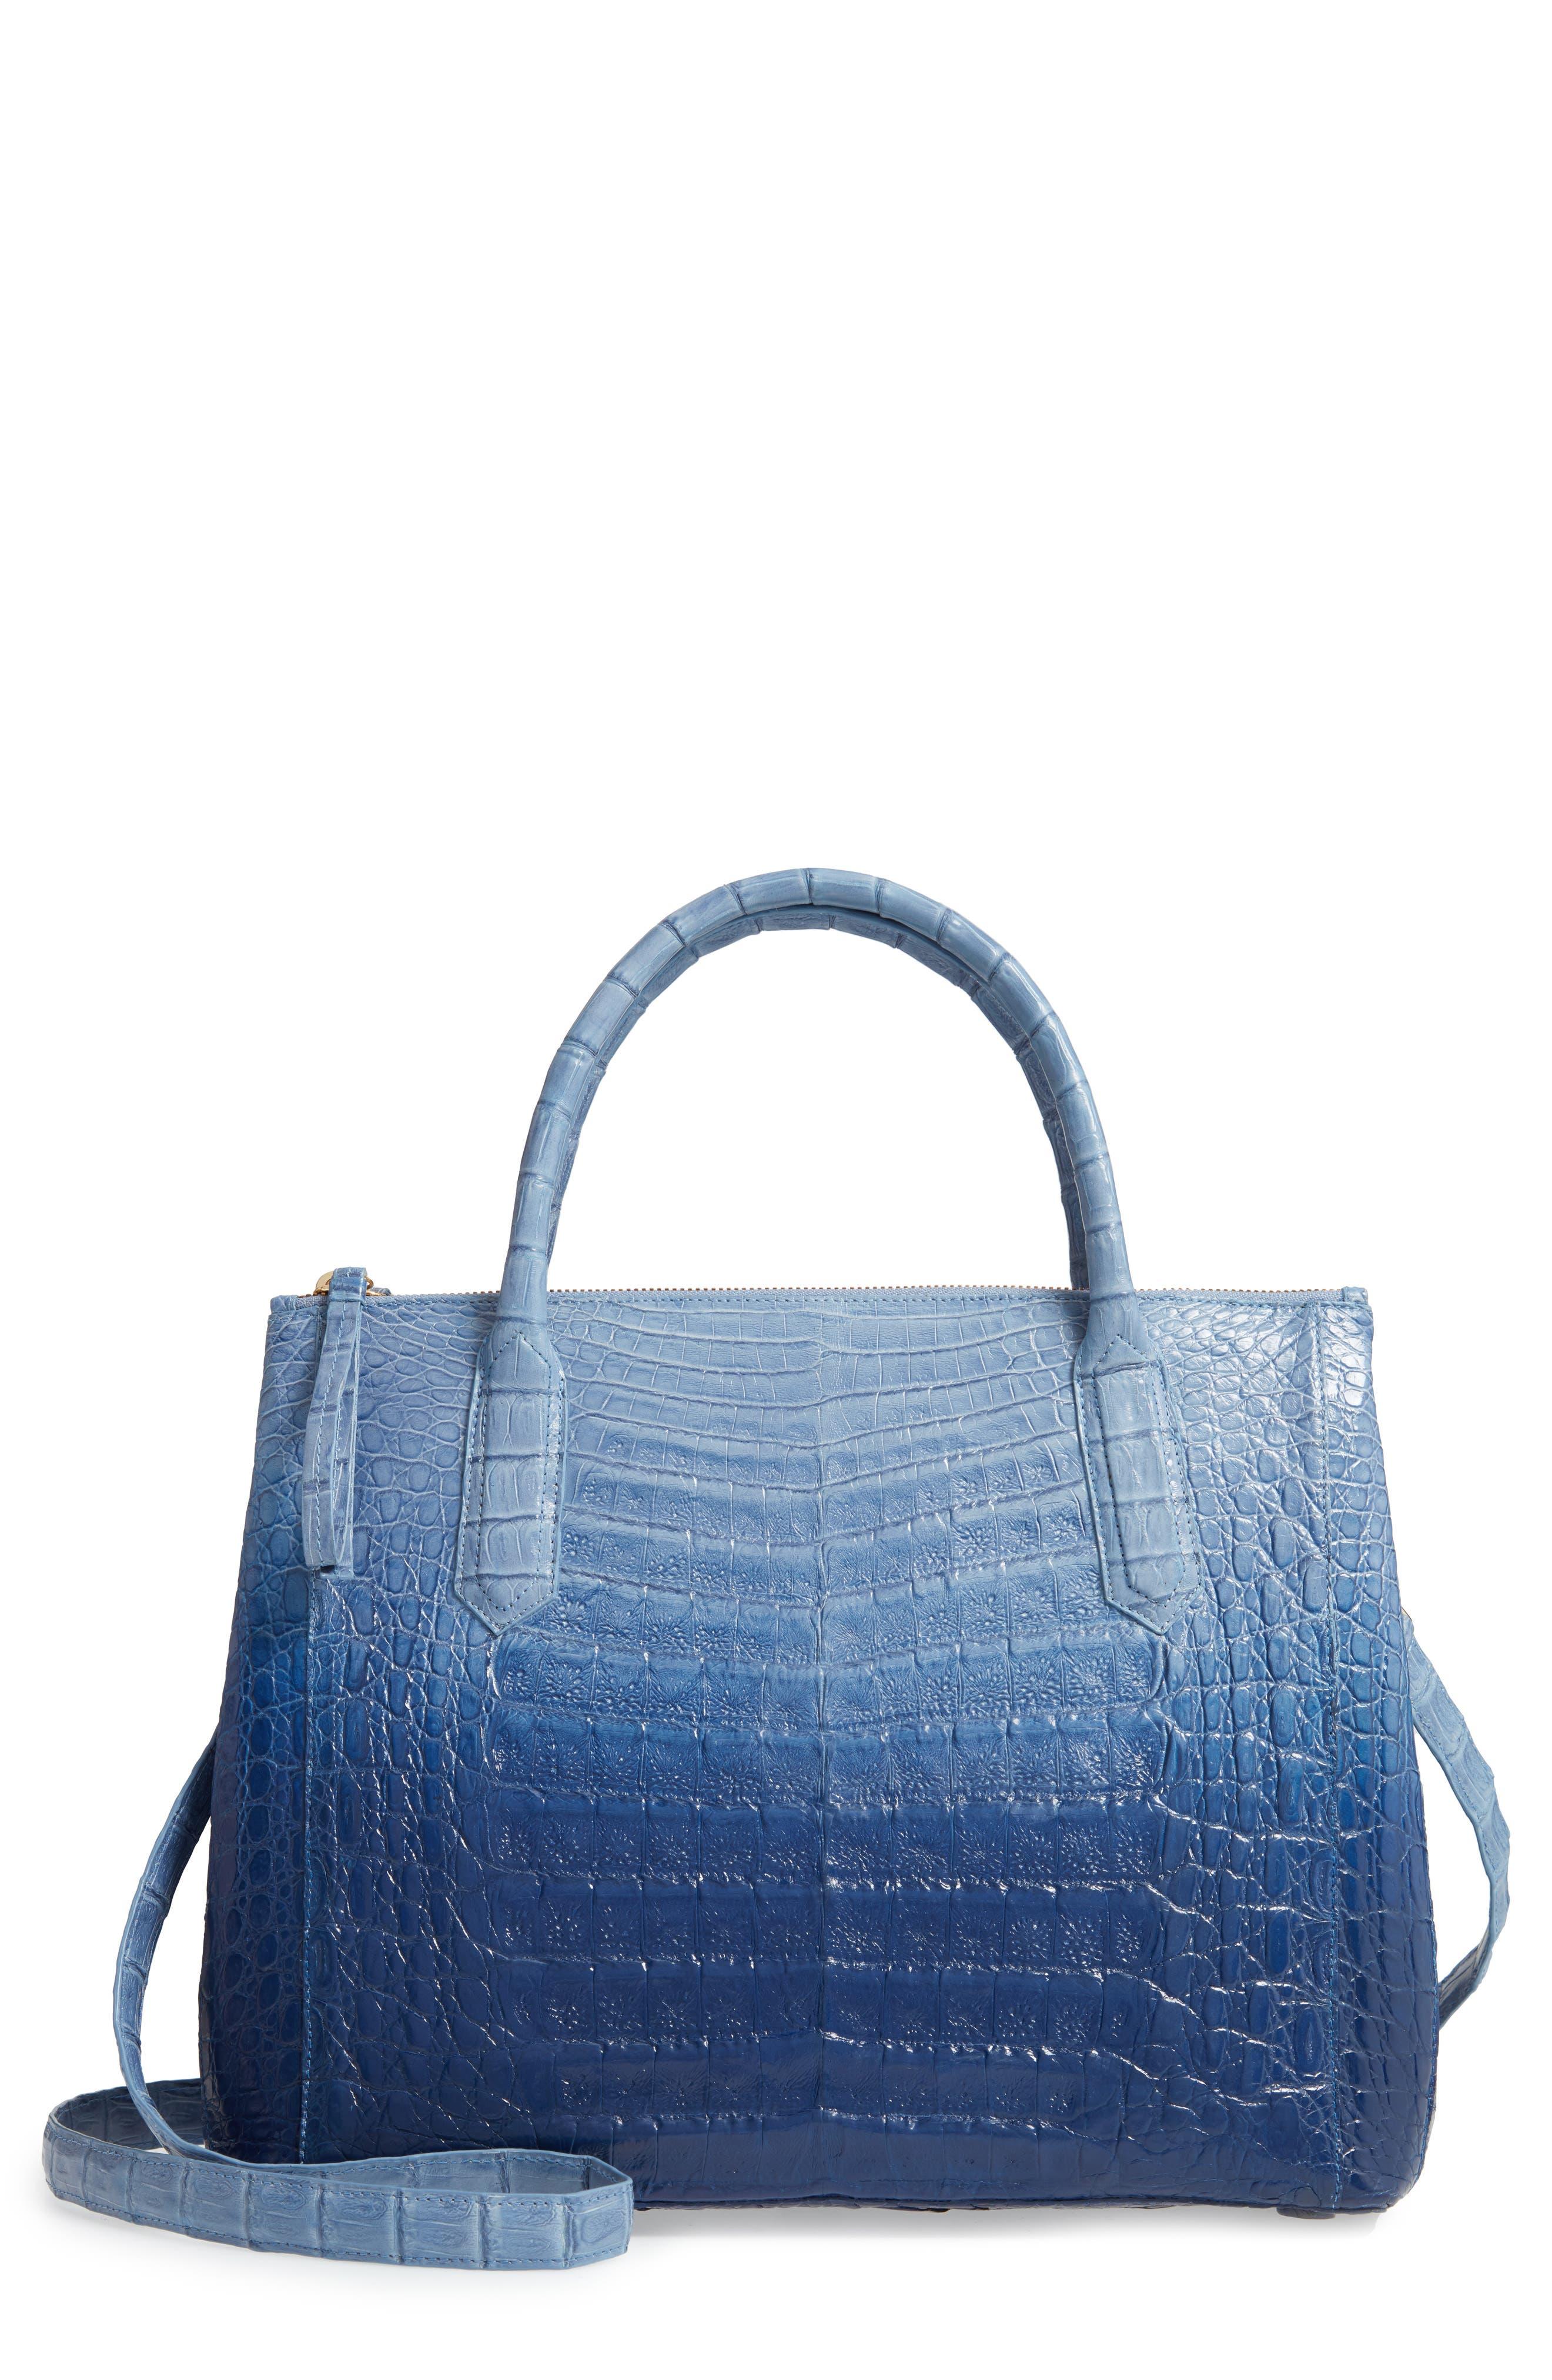 NANCY GONZALEZ Medium Double Zip Genuine Crocodile Tote, Main, color, BLUE DEGRADE